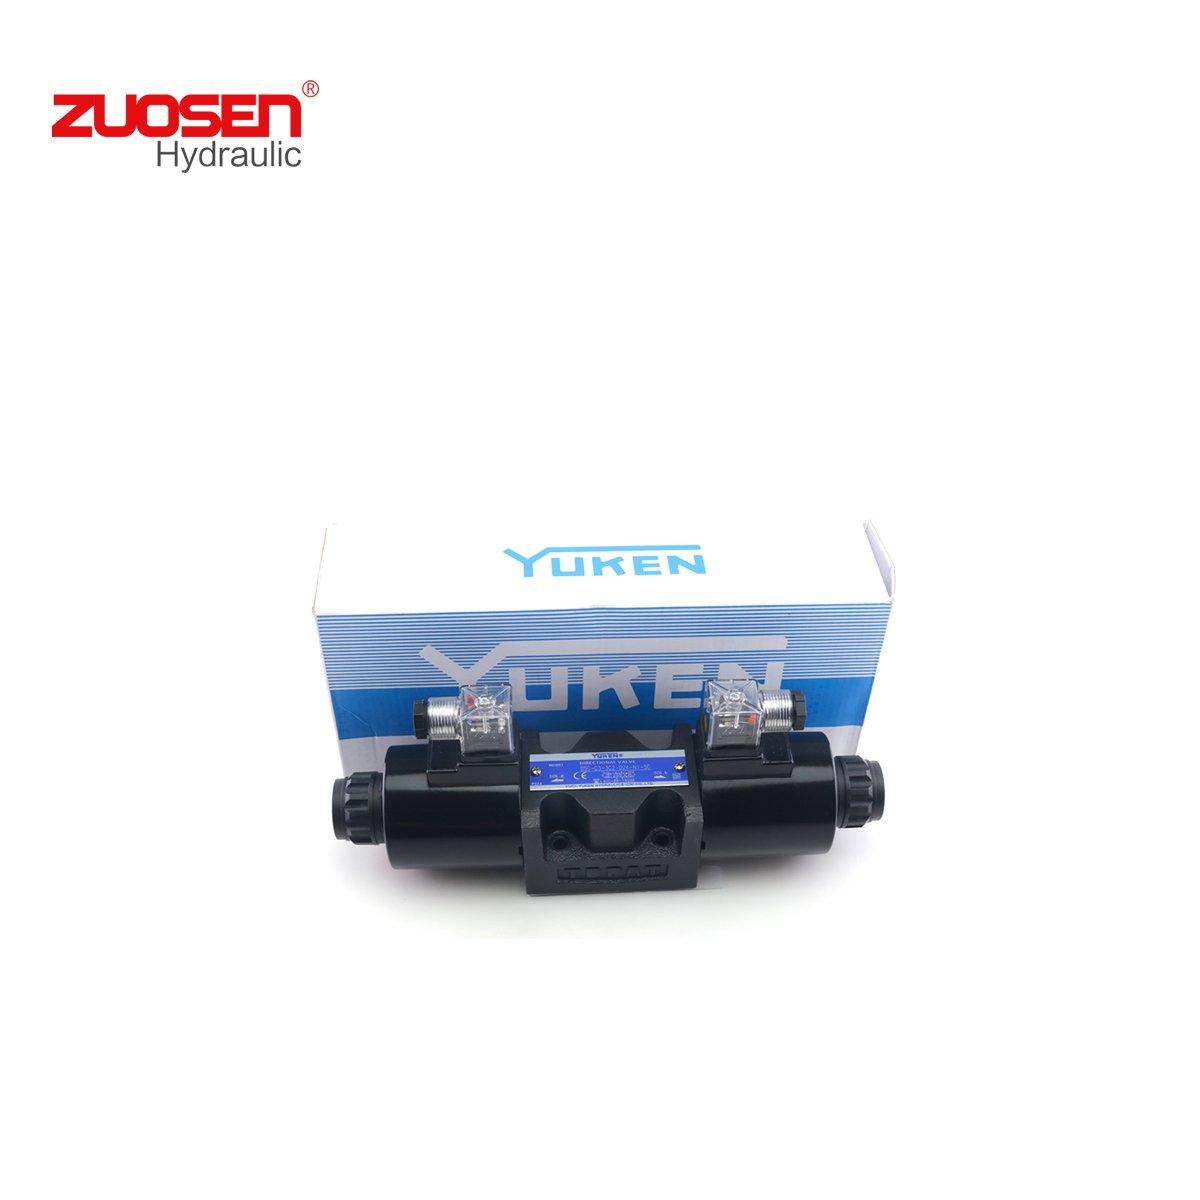 Yuken DSG-03-2C2-A240-N1-50 Hydraulic Valves